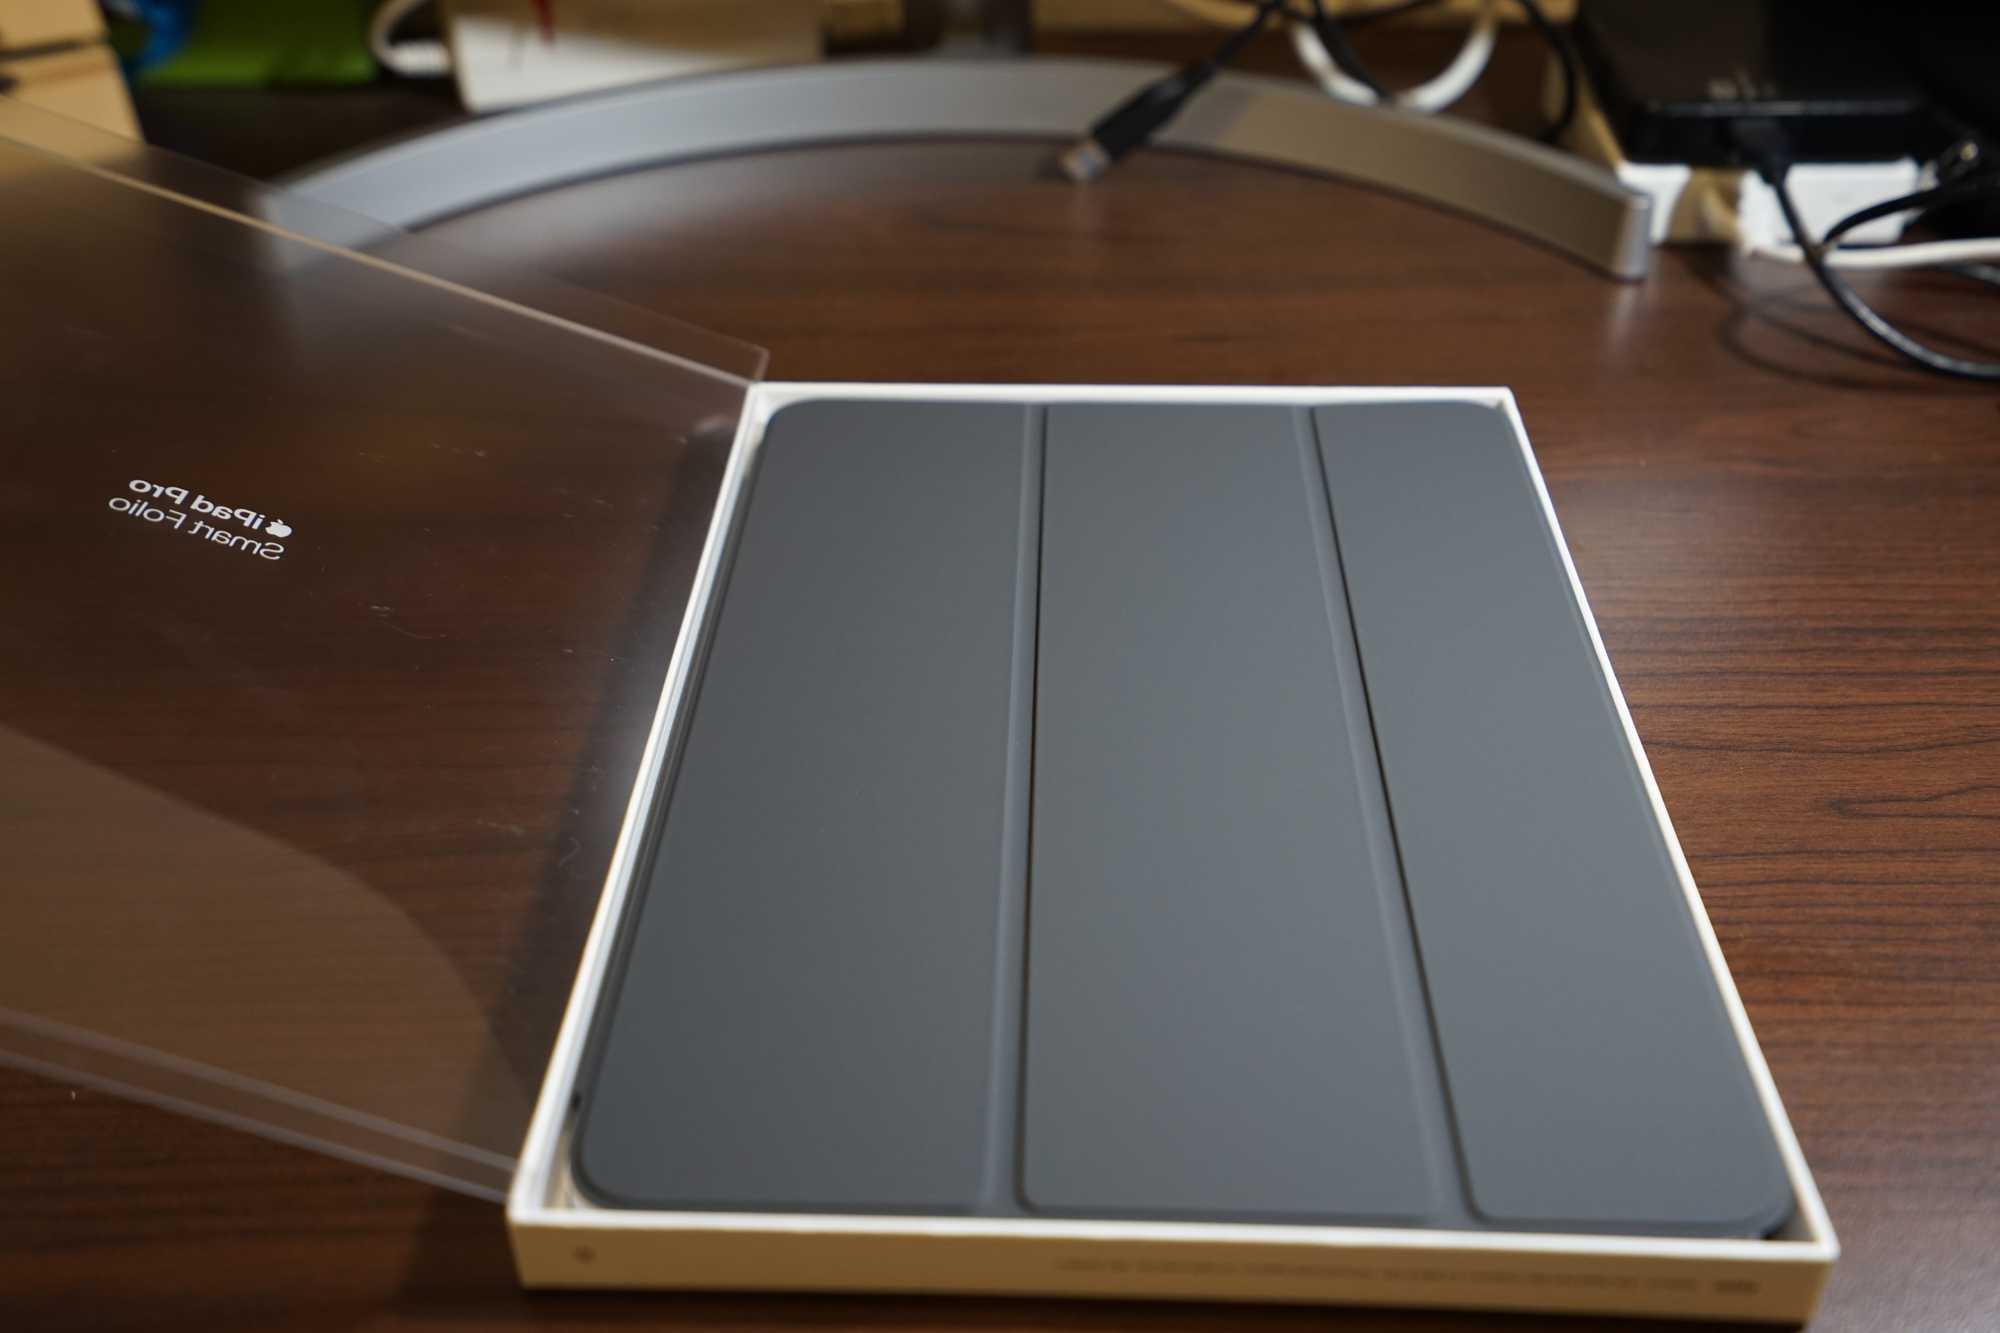 Inside Apple Smart Folio Box